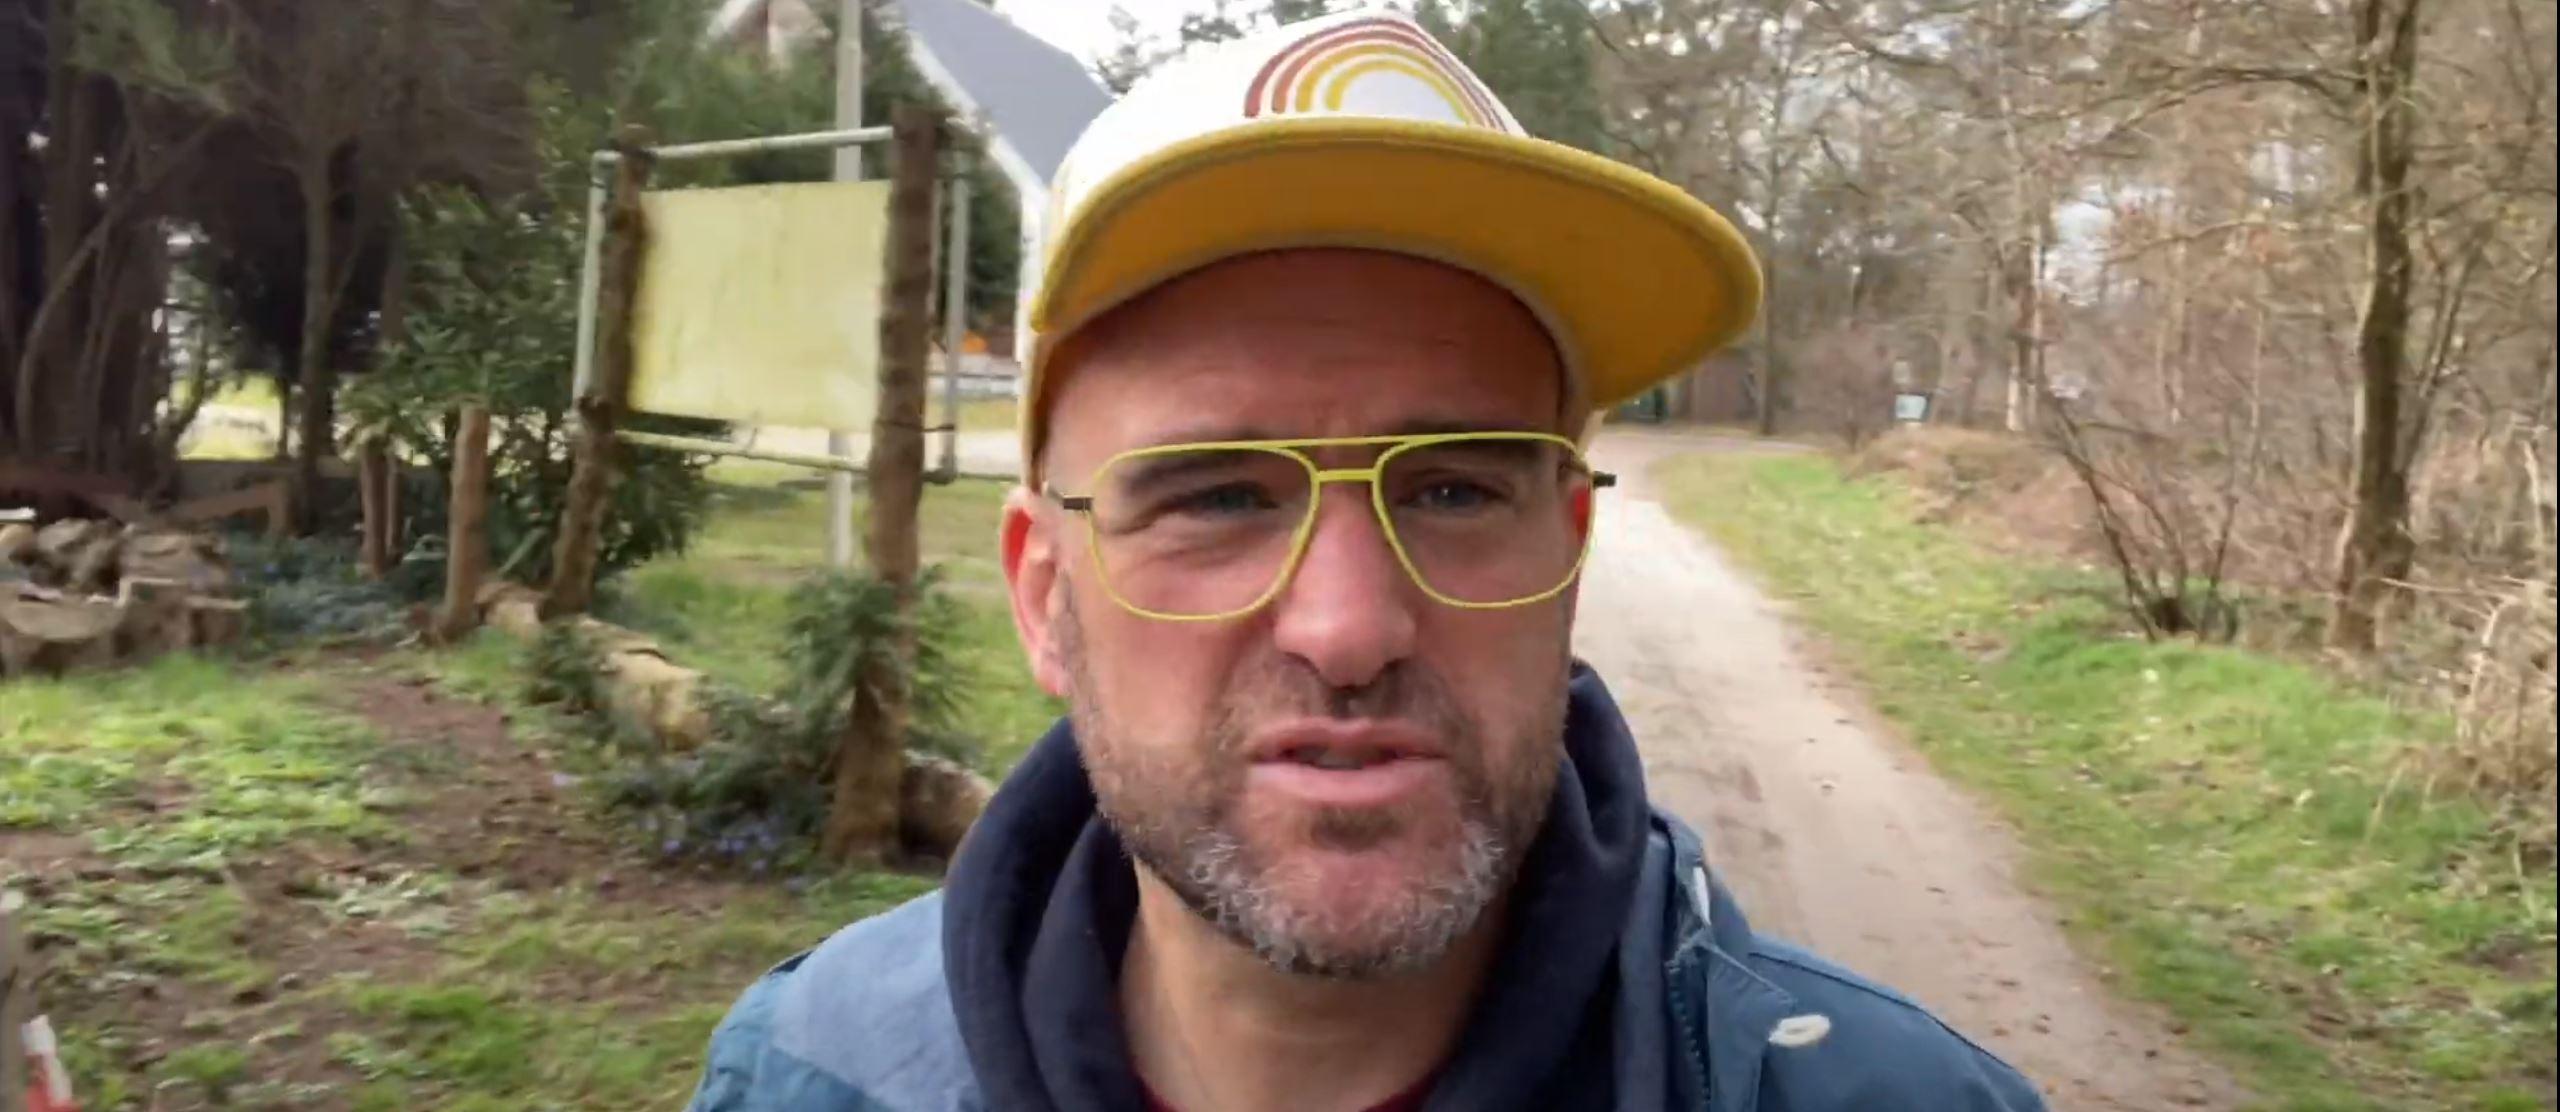 Fatboysrun Episode 241 – Self Made Ultramarathon